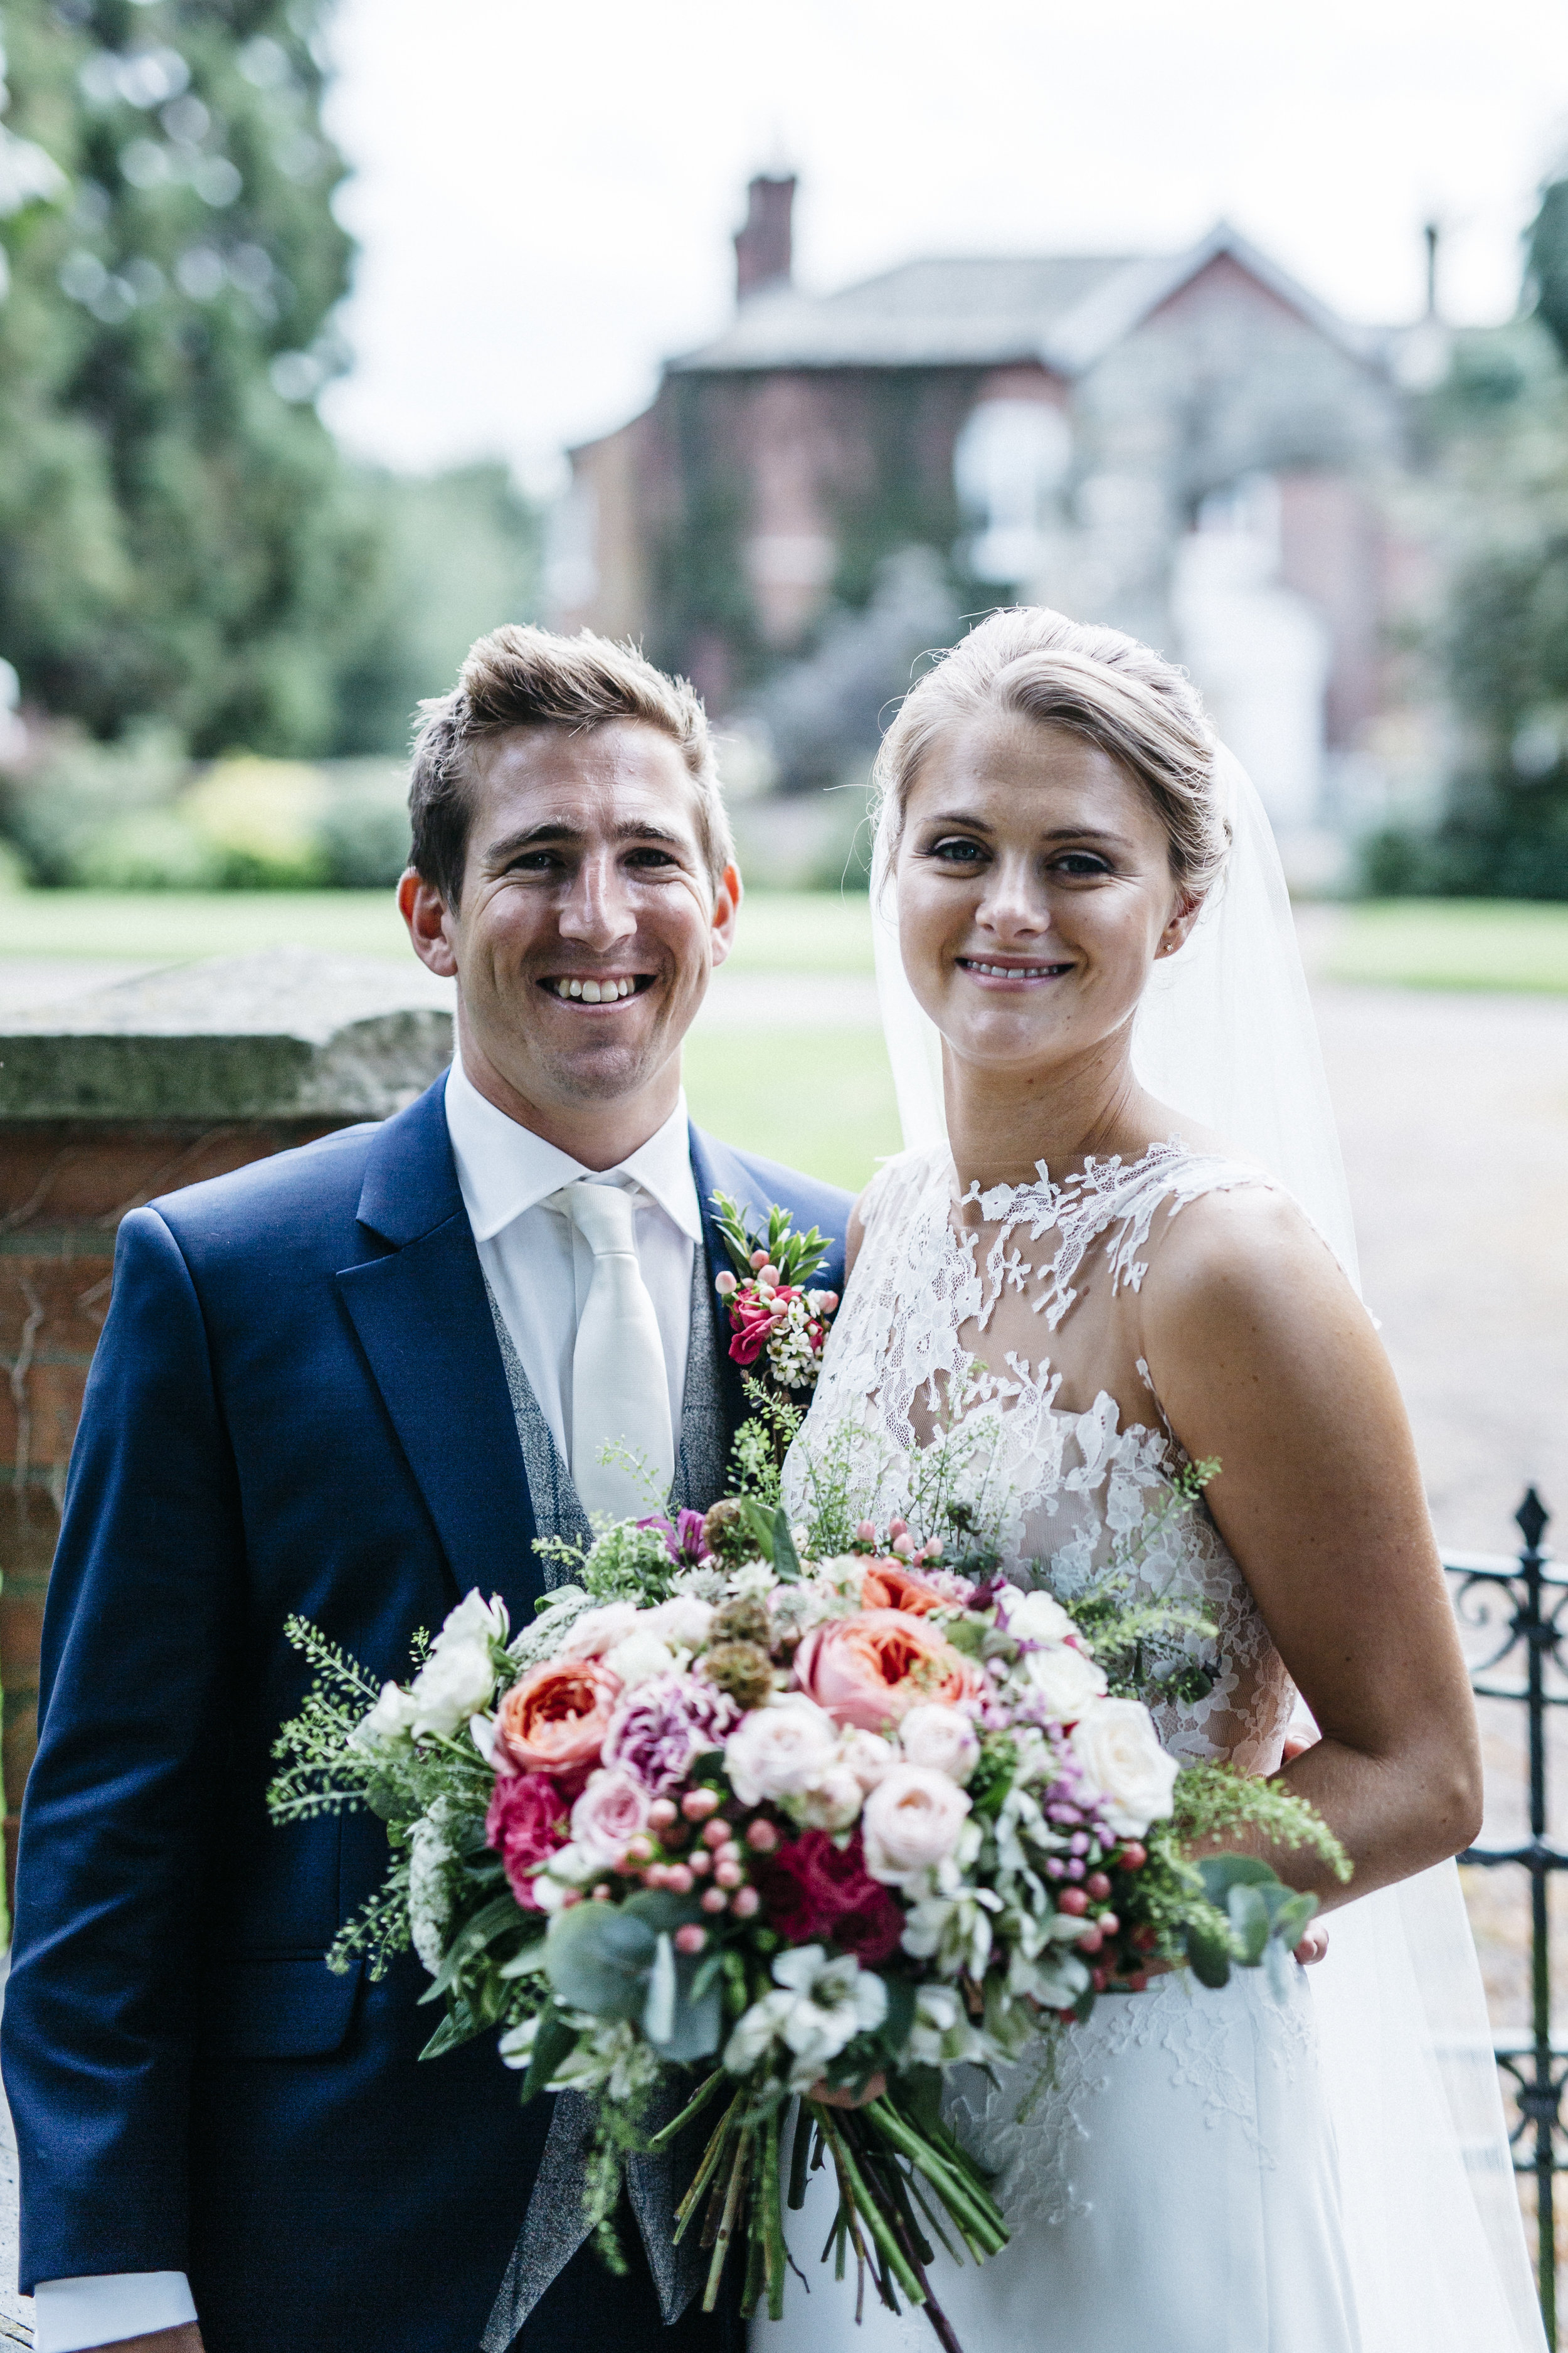 Motture Wedding-Helen & Alex-25 (1).jpg